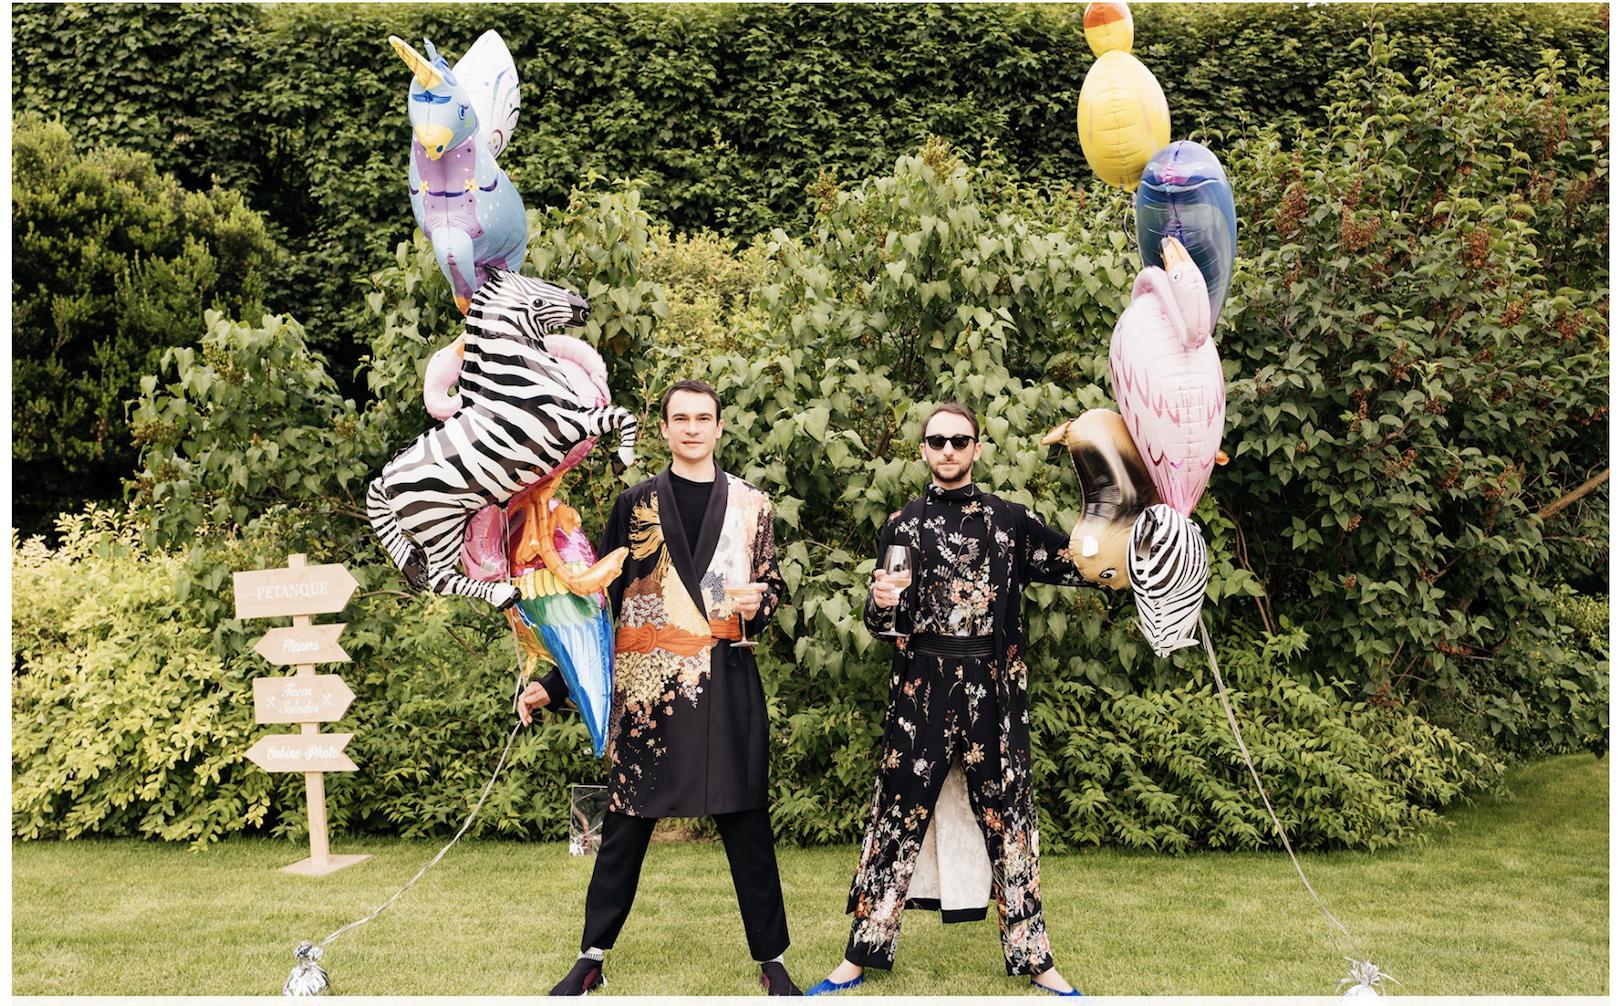 More balloons Anniversary photoshoot, Vogue wedding, The